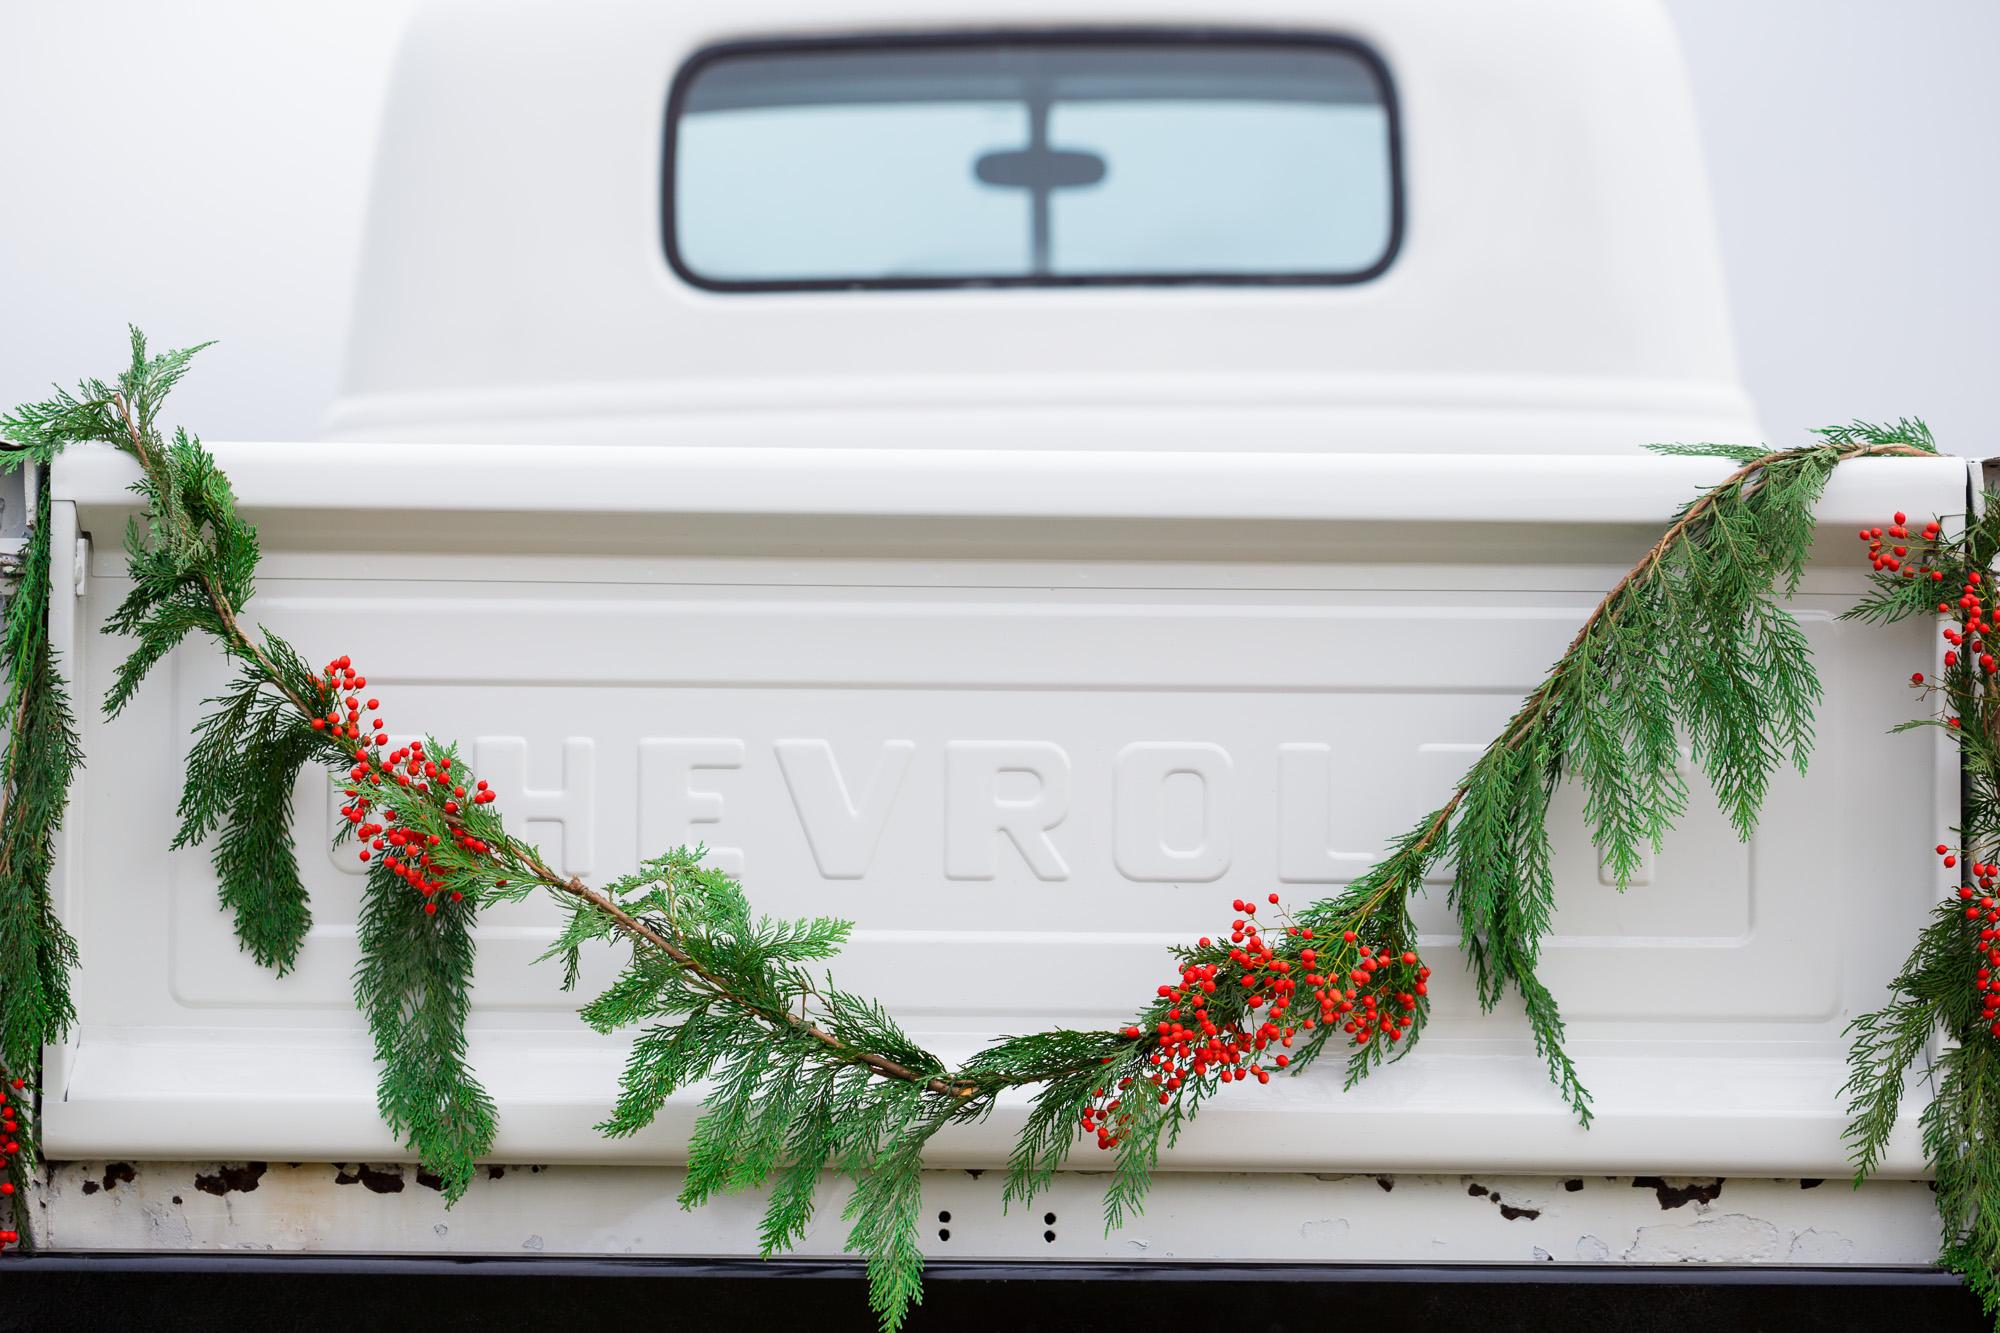 Vintage Chevy Truck Engagement Photos - Christmas Tree Farm Engagement Photos by Joshua Rainey Photography